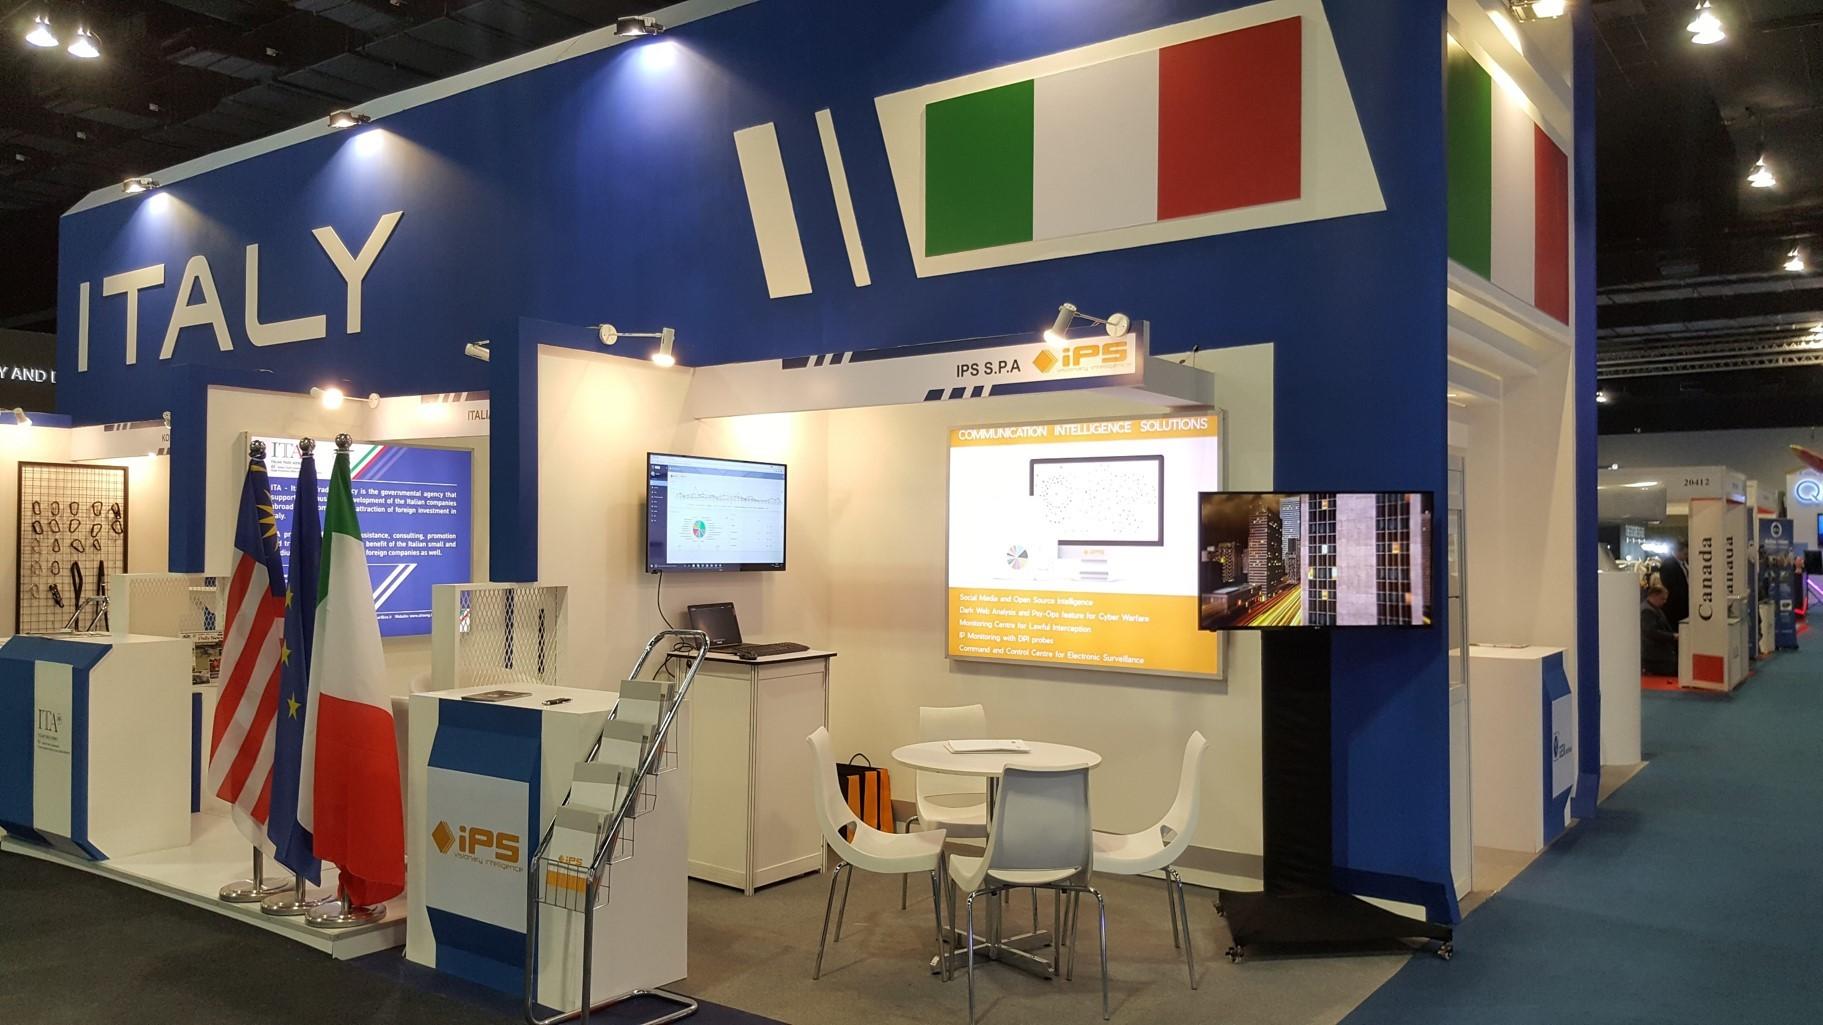 La excelencia tecnológica italiana vuela a Malasia